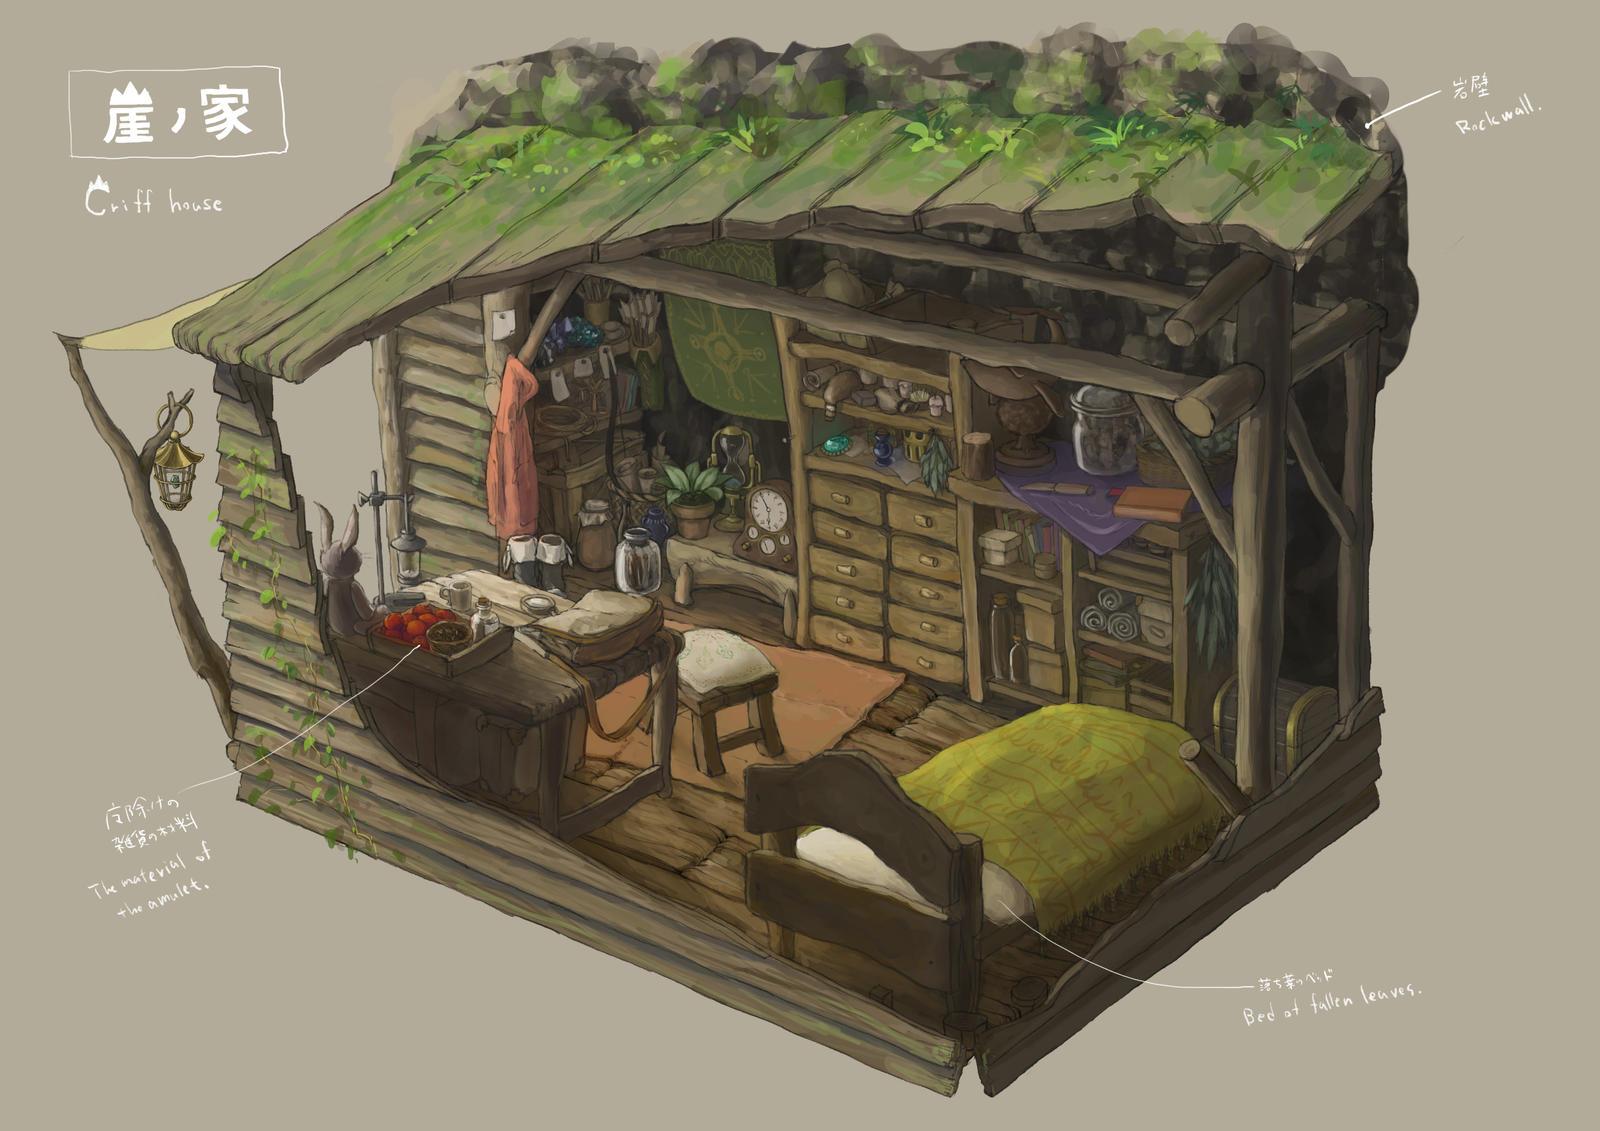 [SVIGNORE] Criff house in Amie Village by Nonohara-Susu